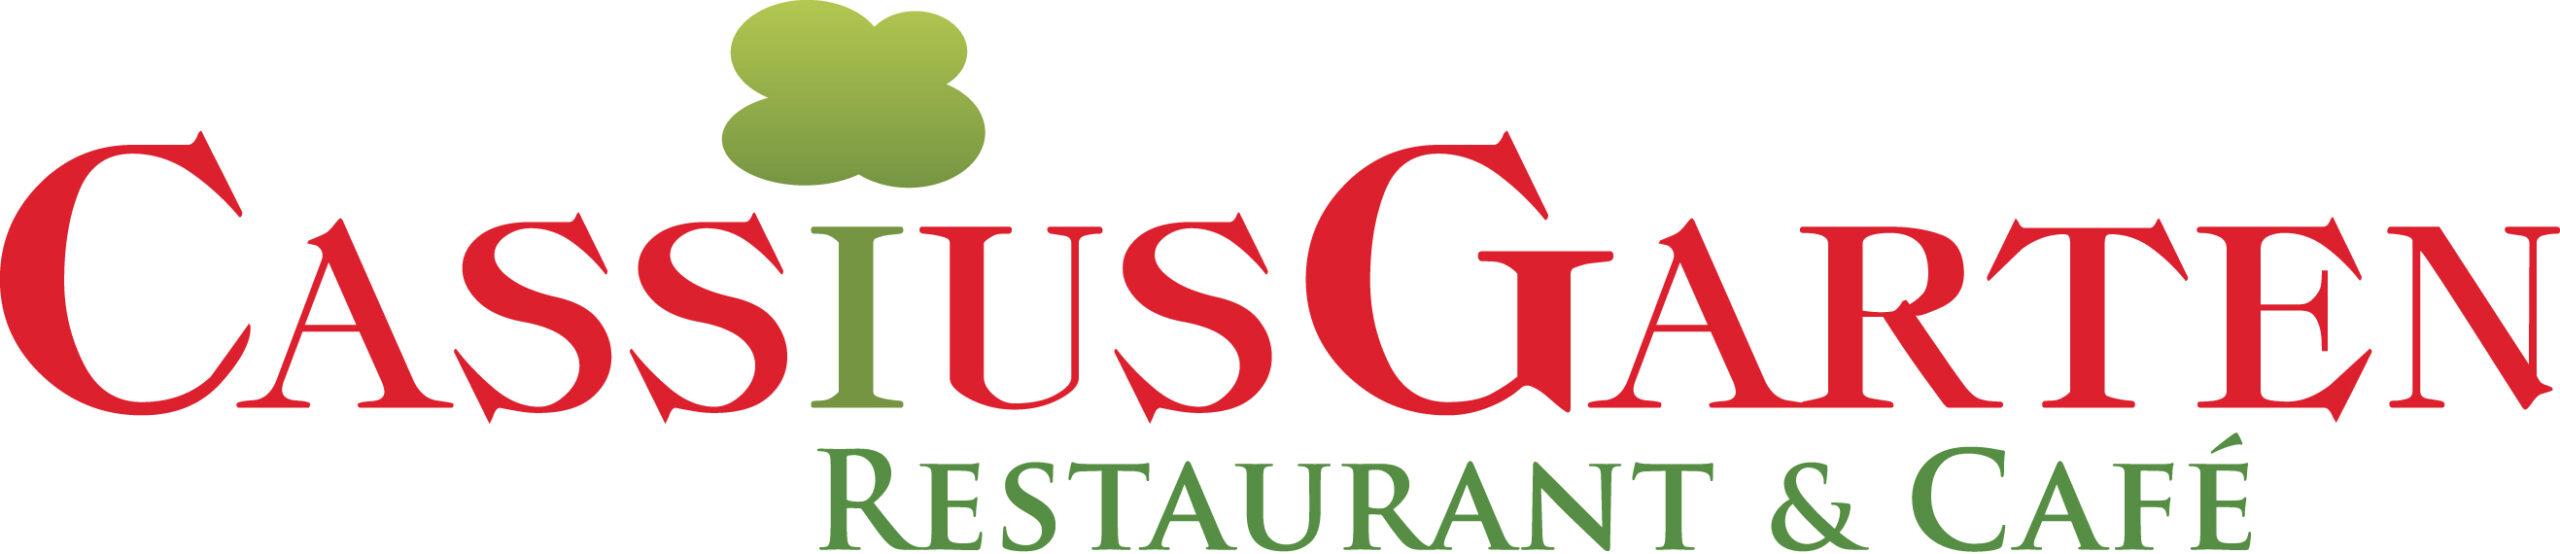 CassiusGarten_logo